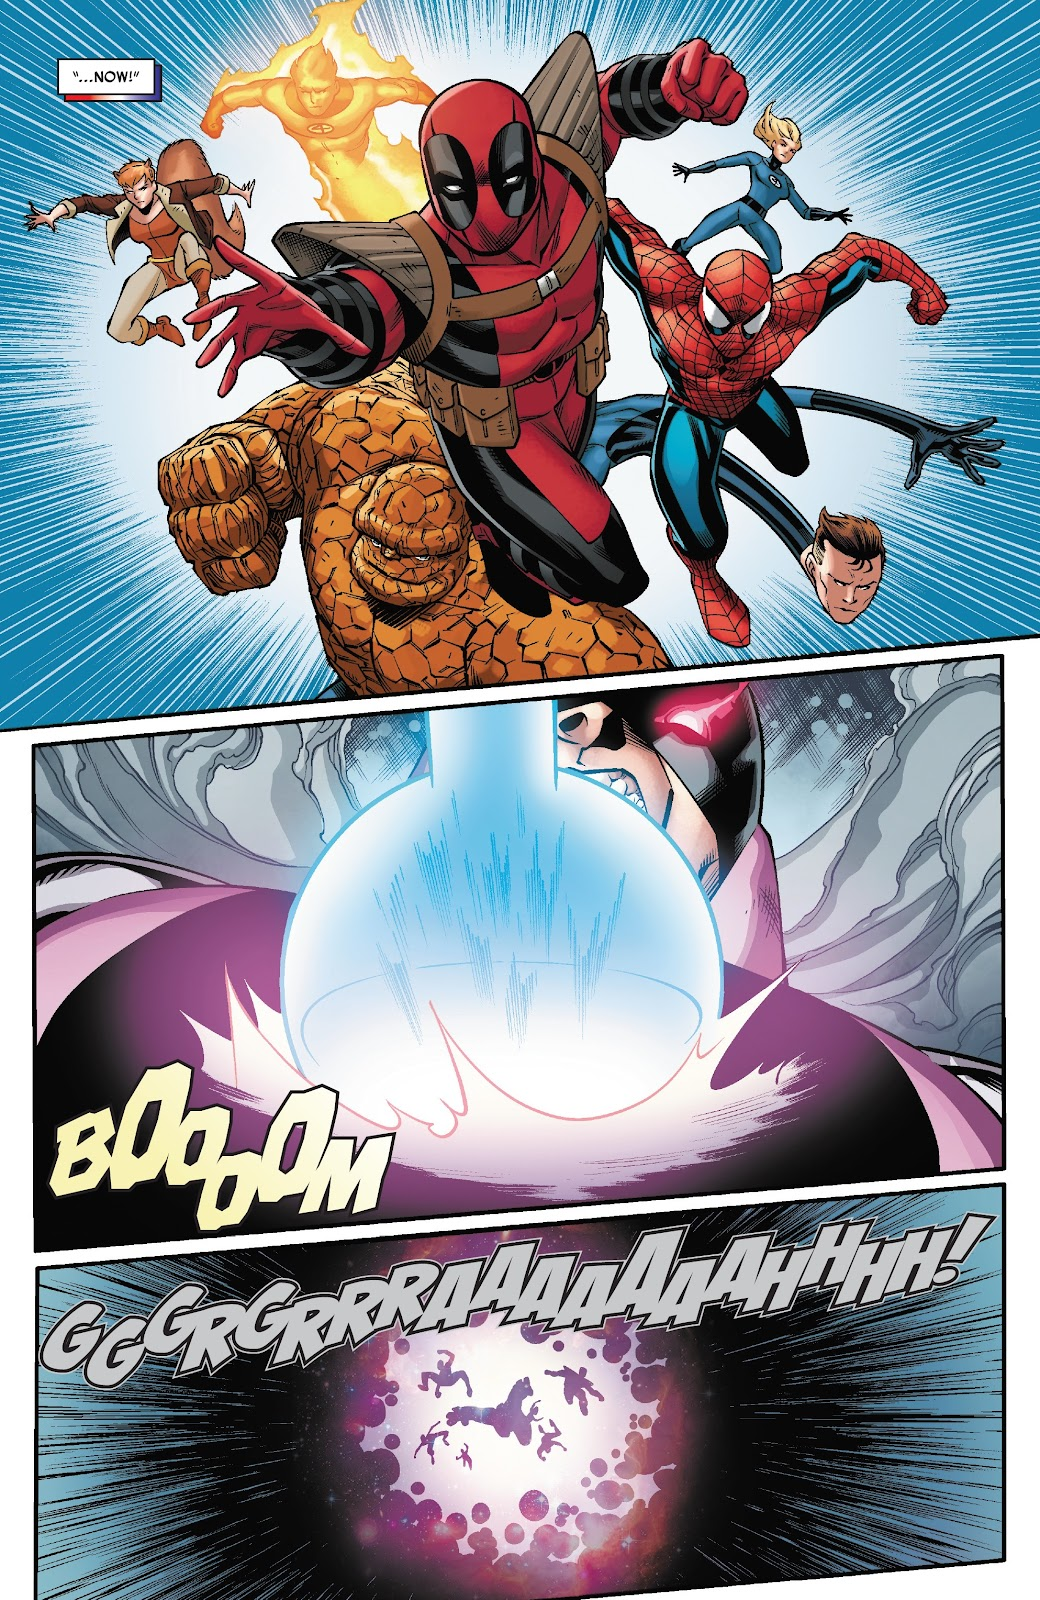 Read online Spider-Man/Deadpool comic -  Issue #49 - 20